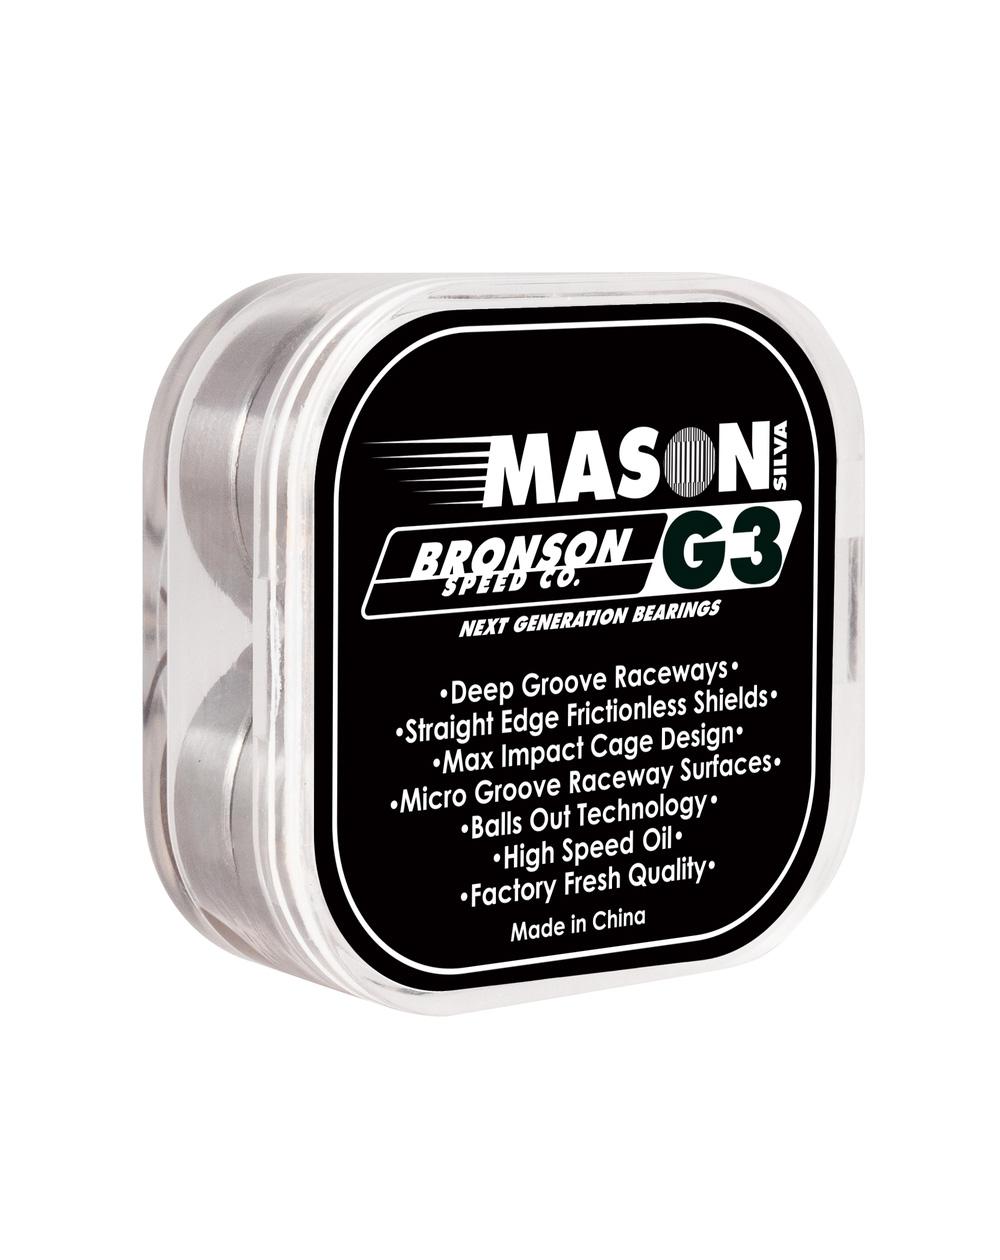 Bronson Speed Co. Rolamentos Skate G3 Pro Mason Silva